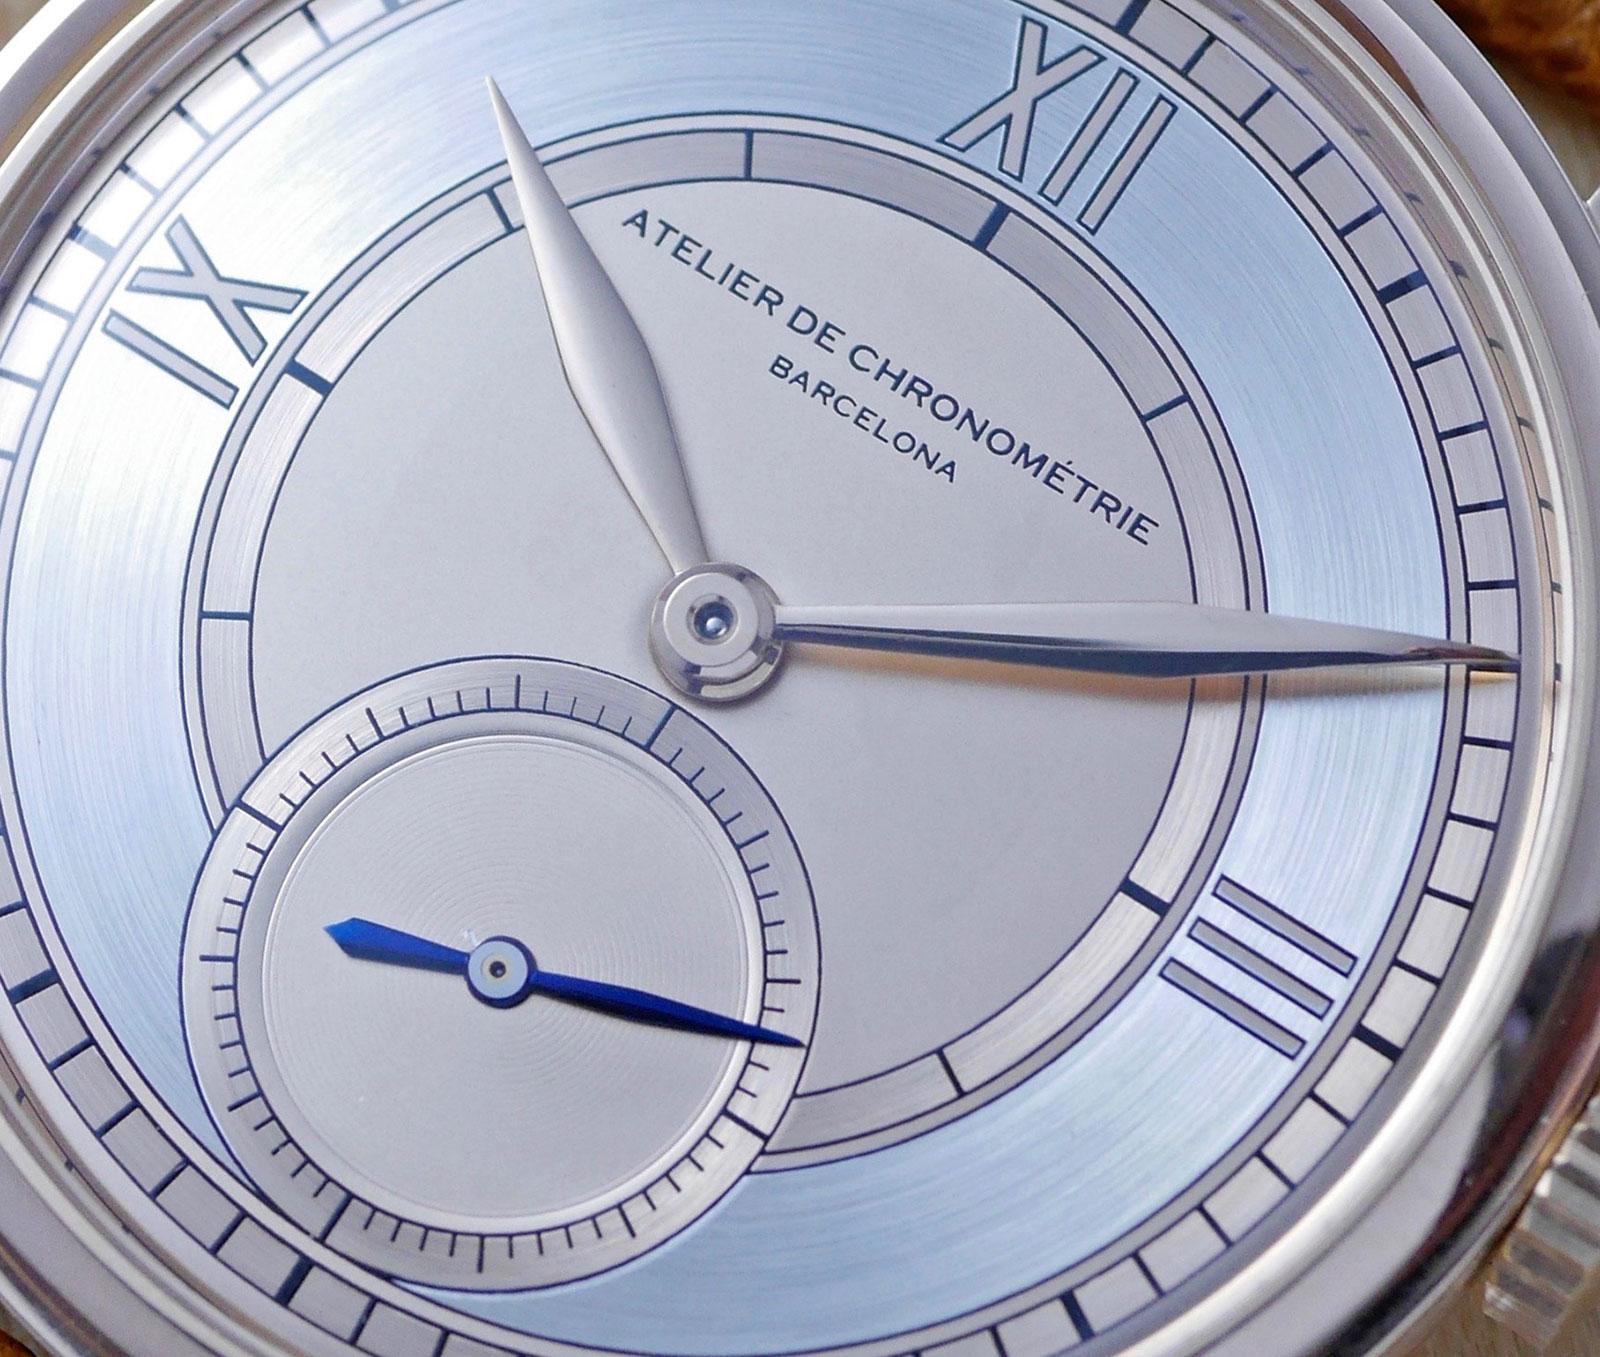 Atelier de Chronometrie AdC #3-2